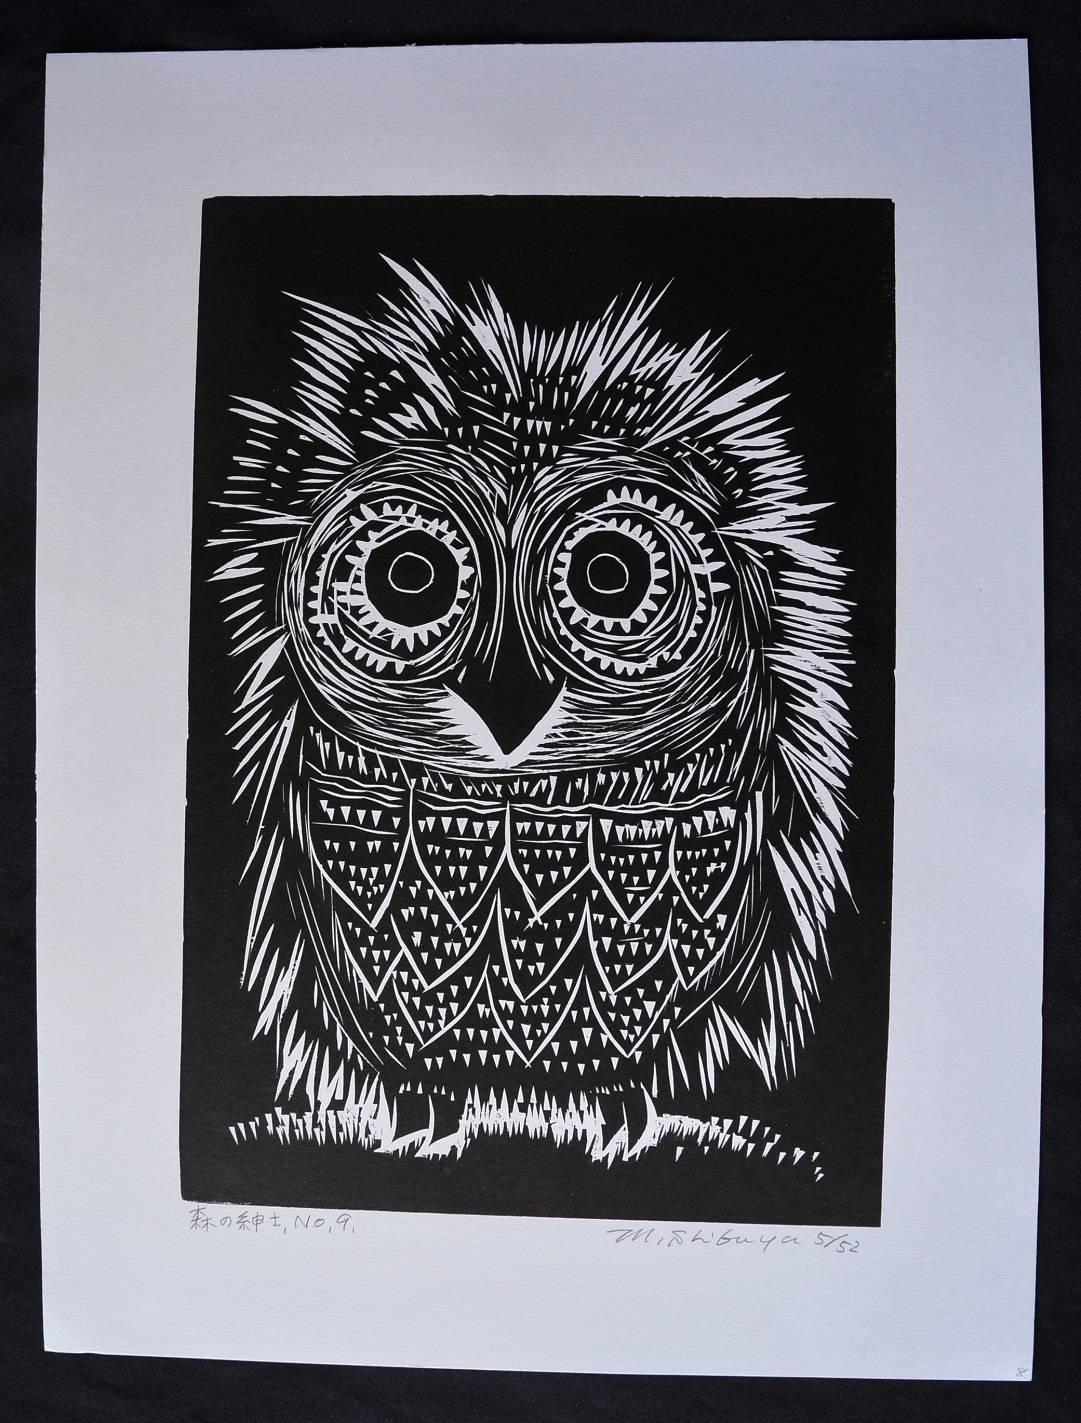 #P4521 FOREST OWL No 9 By MASAKI SHIBUYA